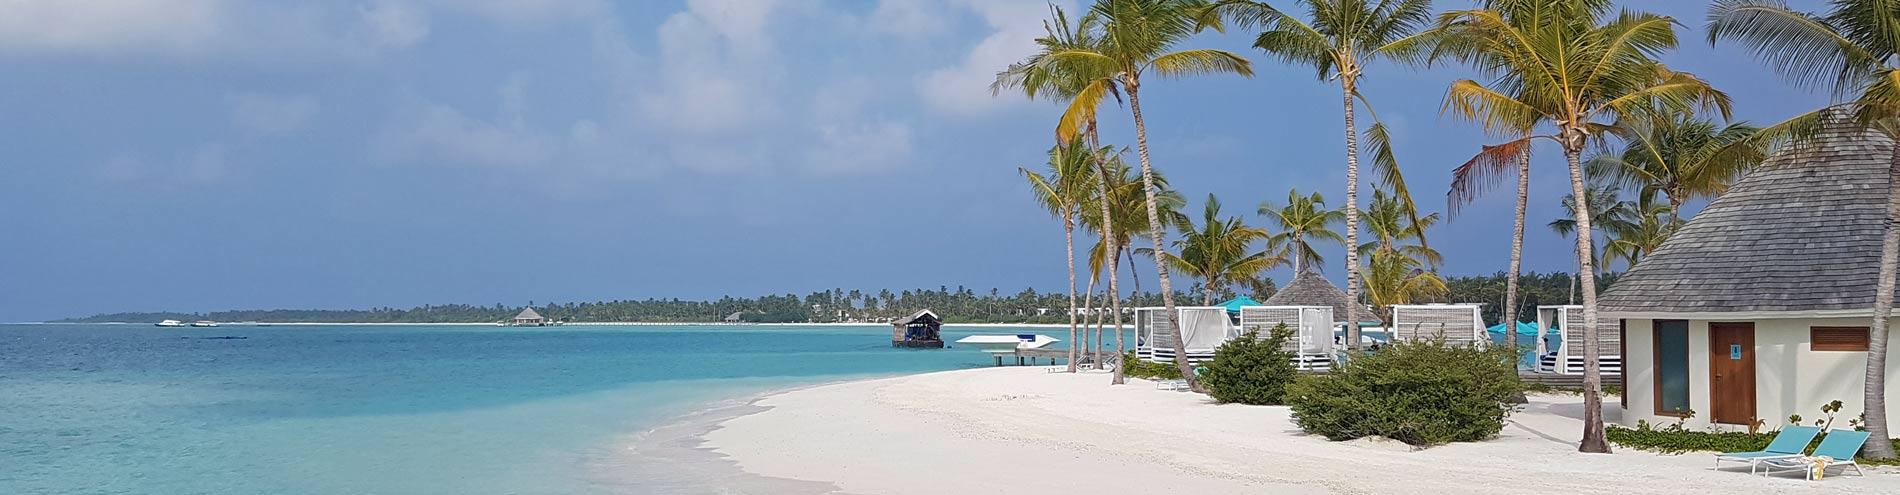 Kandima Maldives: A Maldives Resort for Everyone